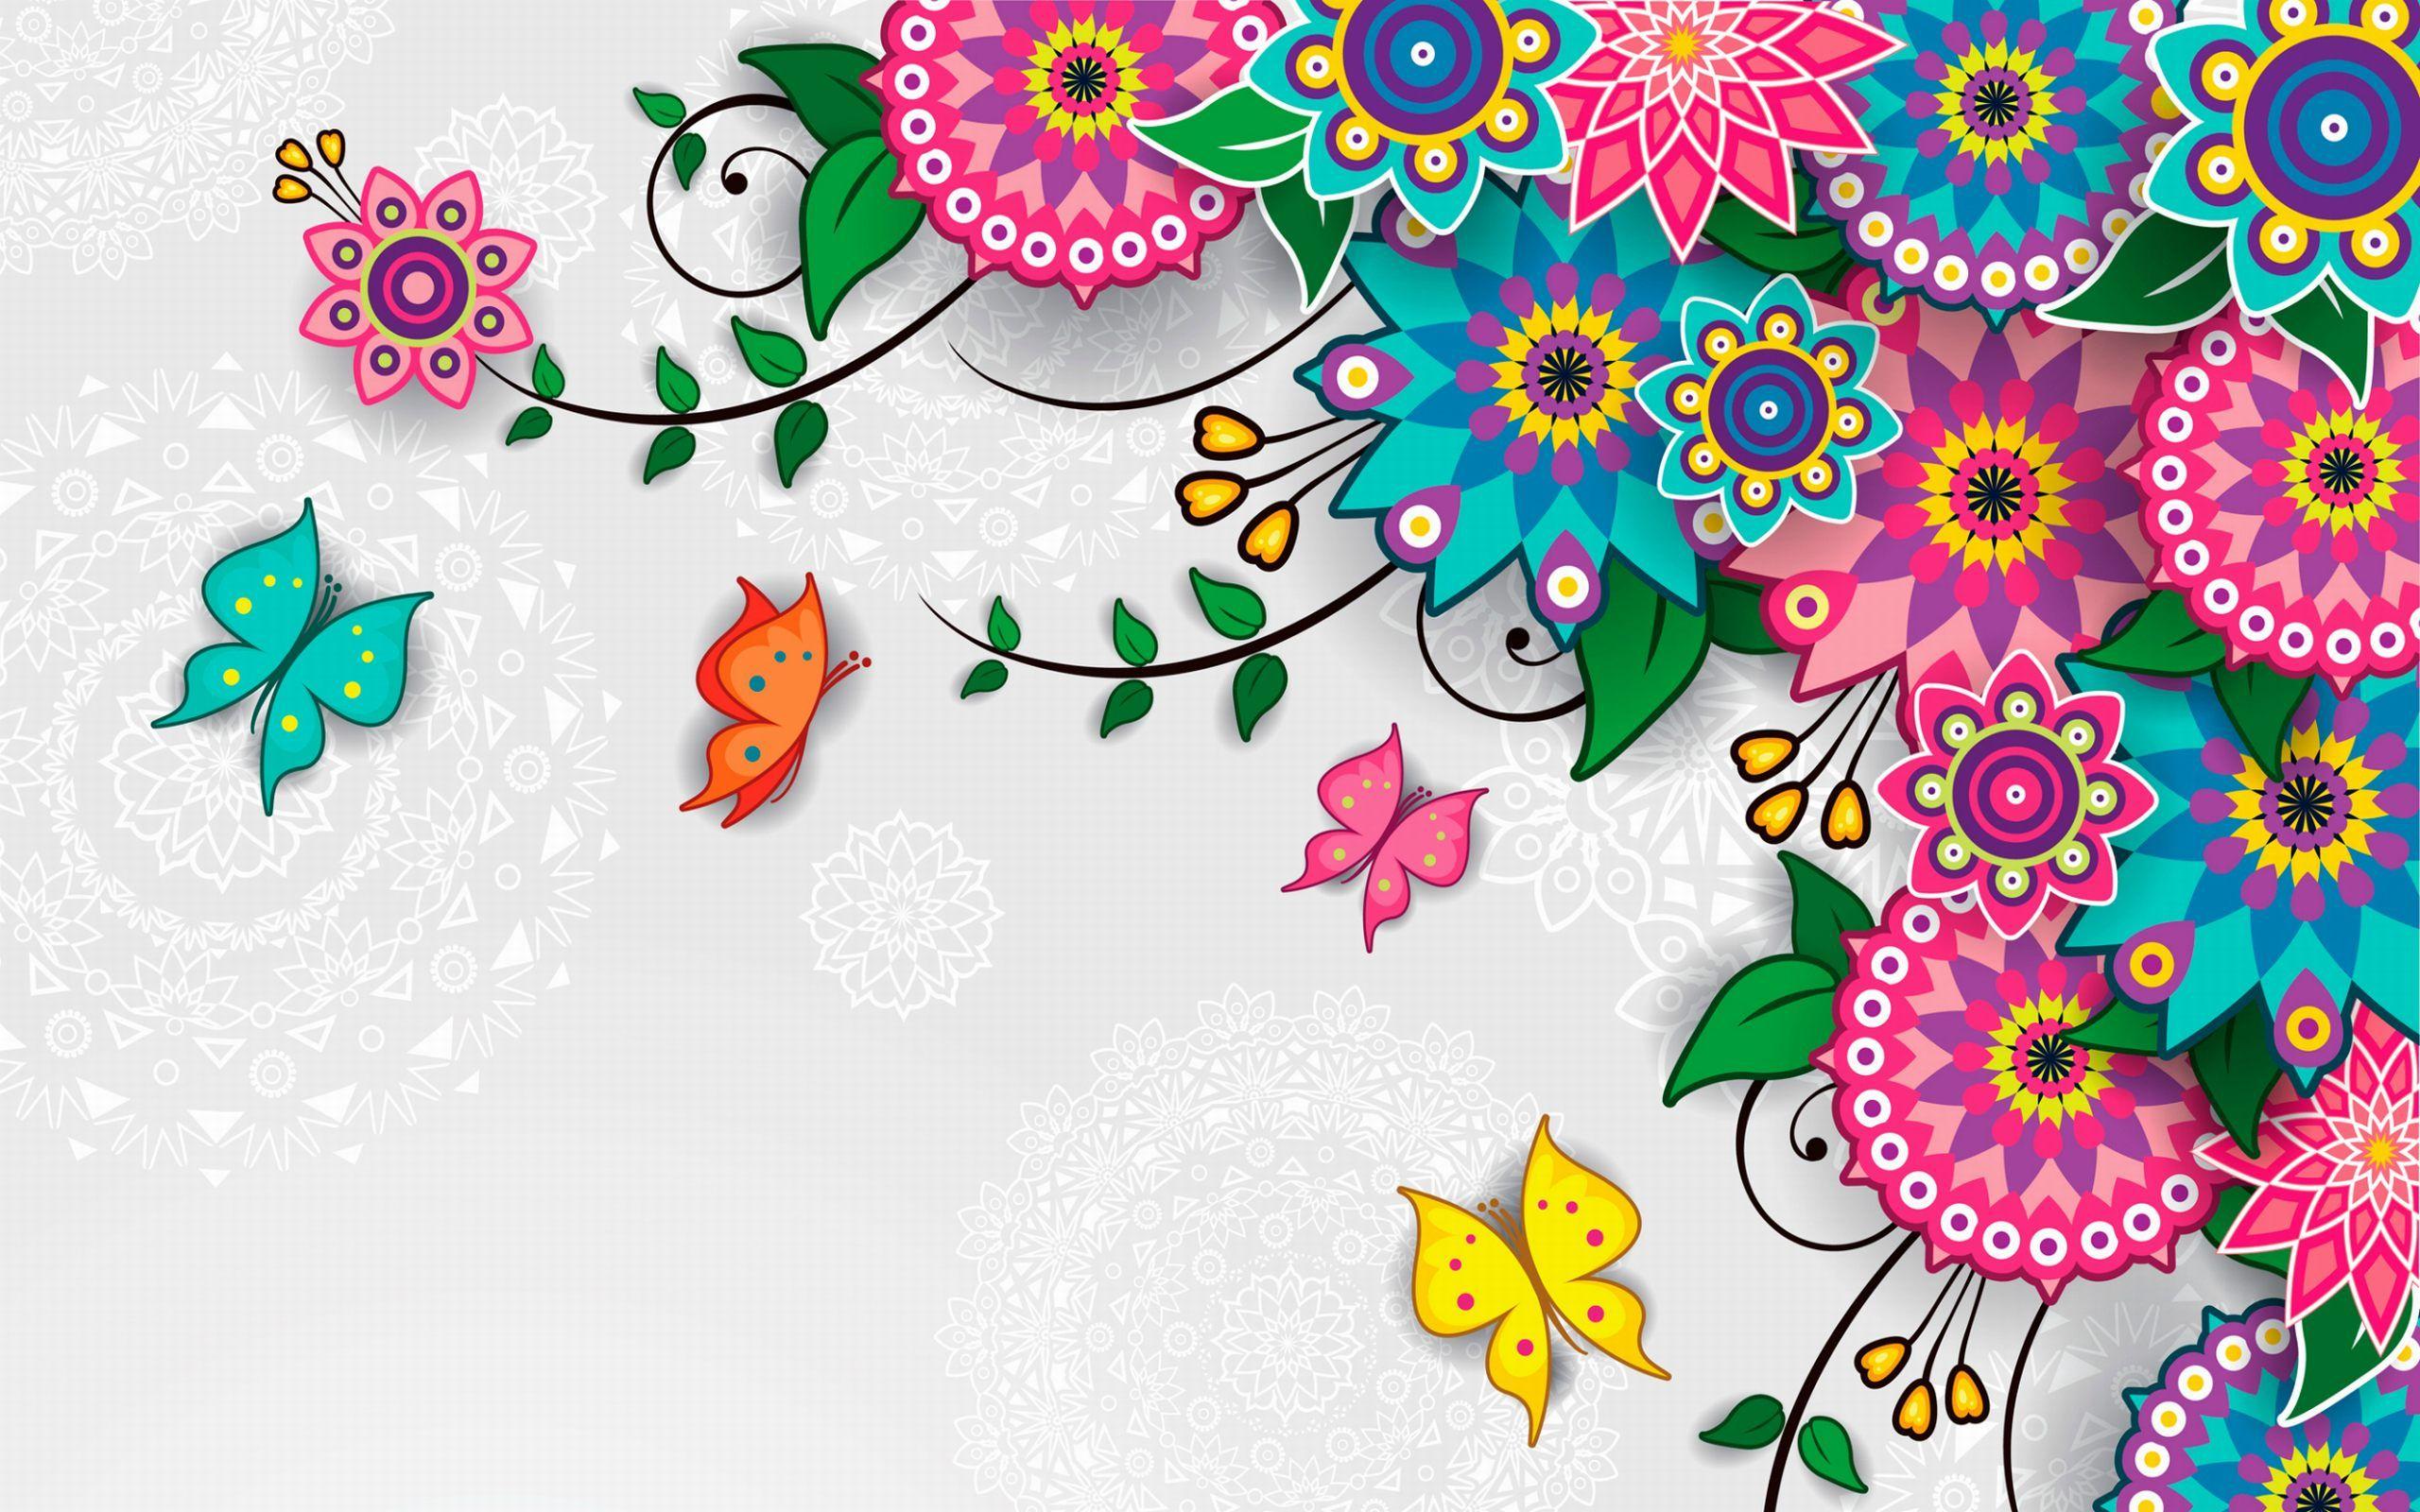 Flowers Pattern Vector Art Background Wallpaper for